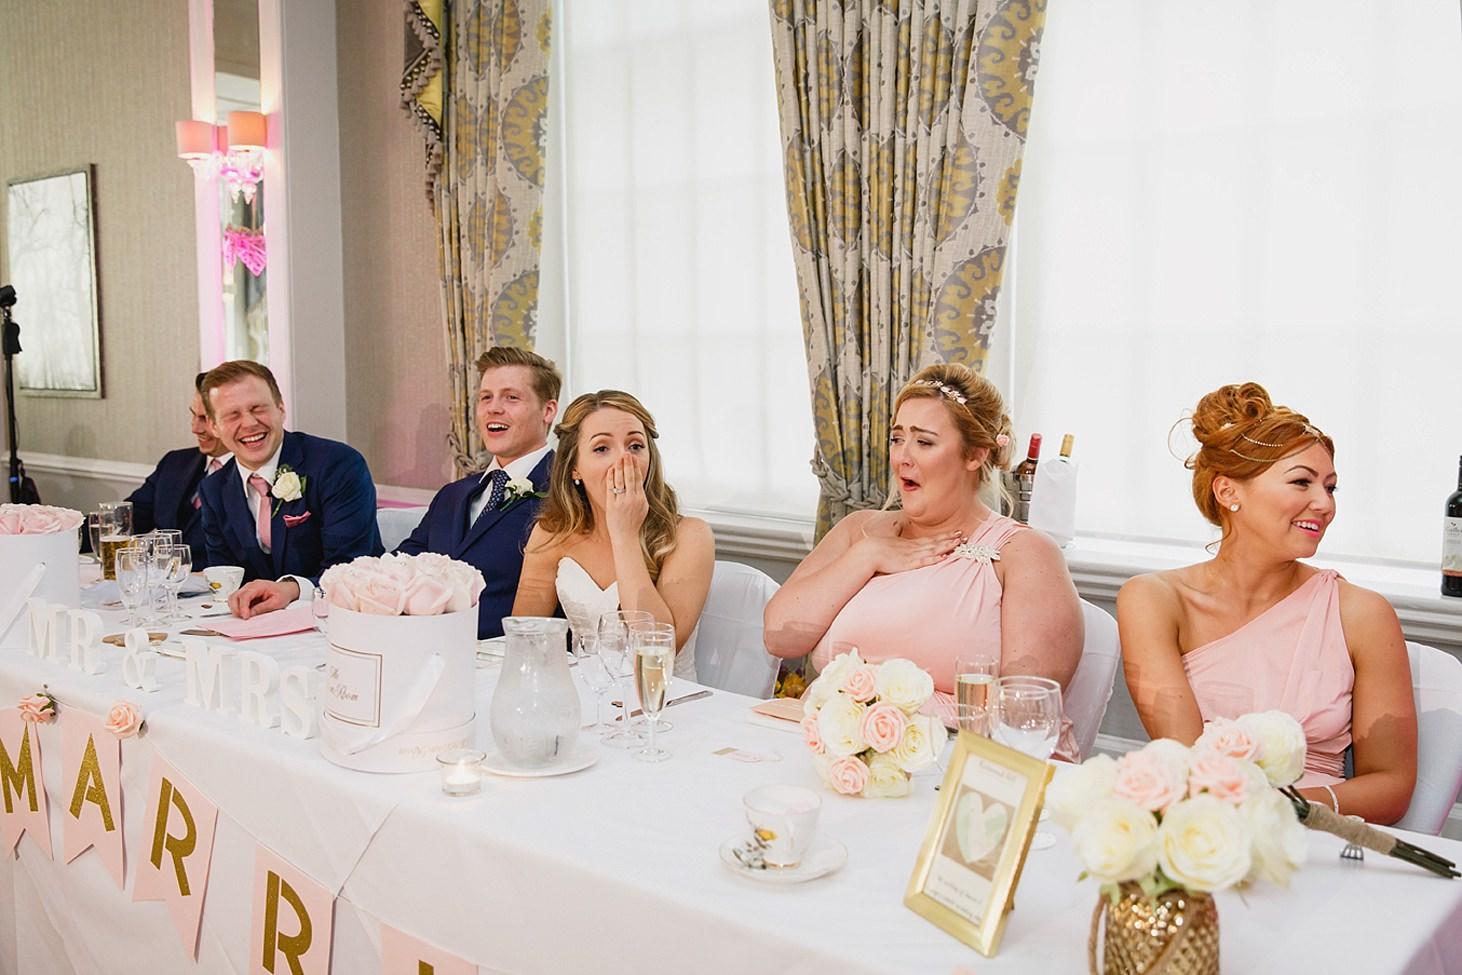 richmond hill wedding photography bride reaction to speech